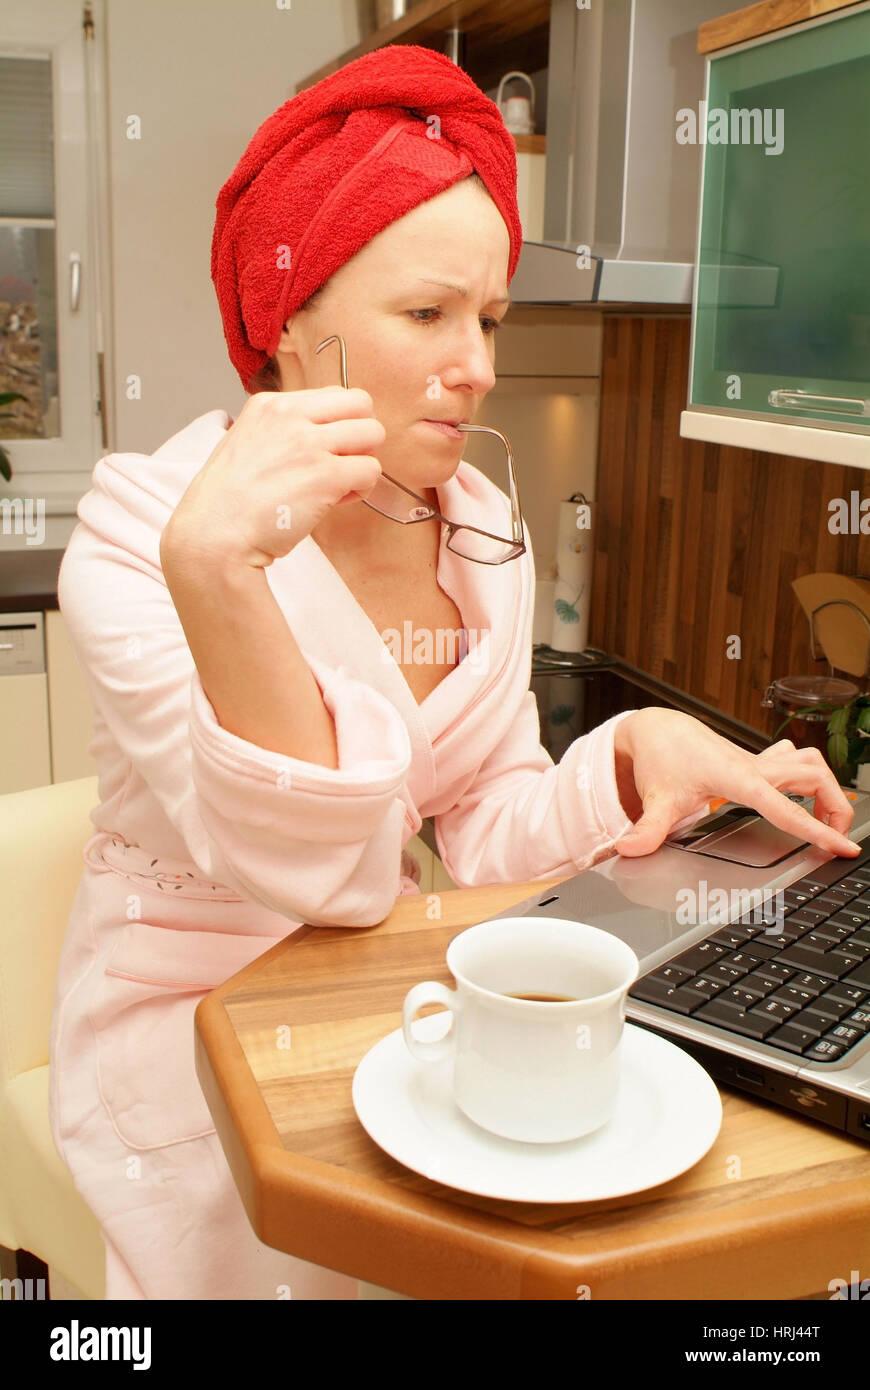 Junge Frau im Morgenmantel sitzt an der K?chenbar und arbeitet am Notebook - young woman at home using laptop - Stock Image